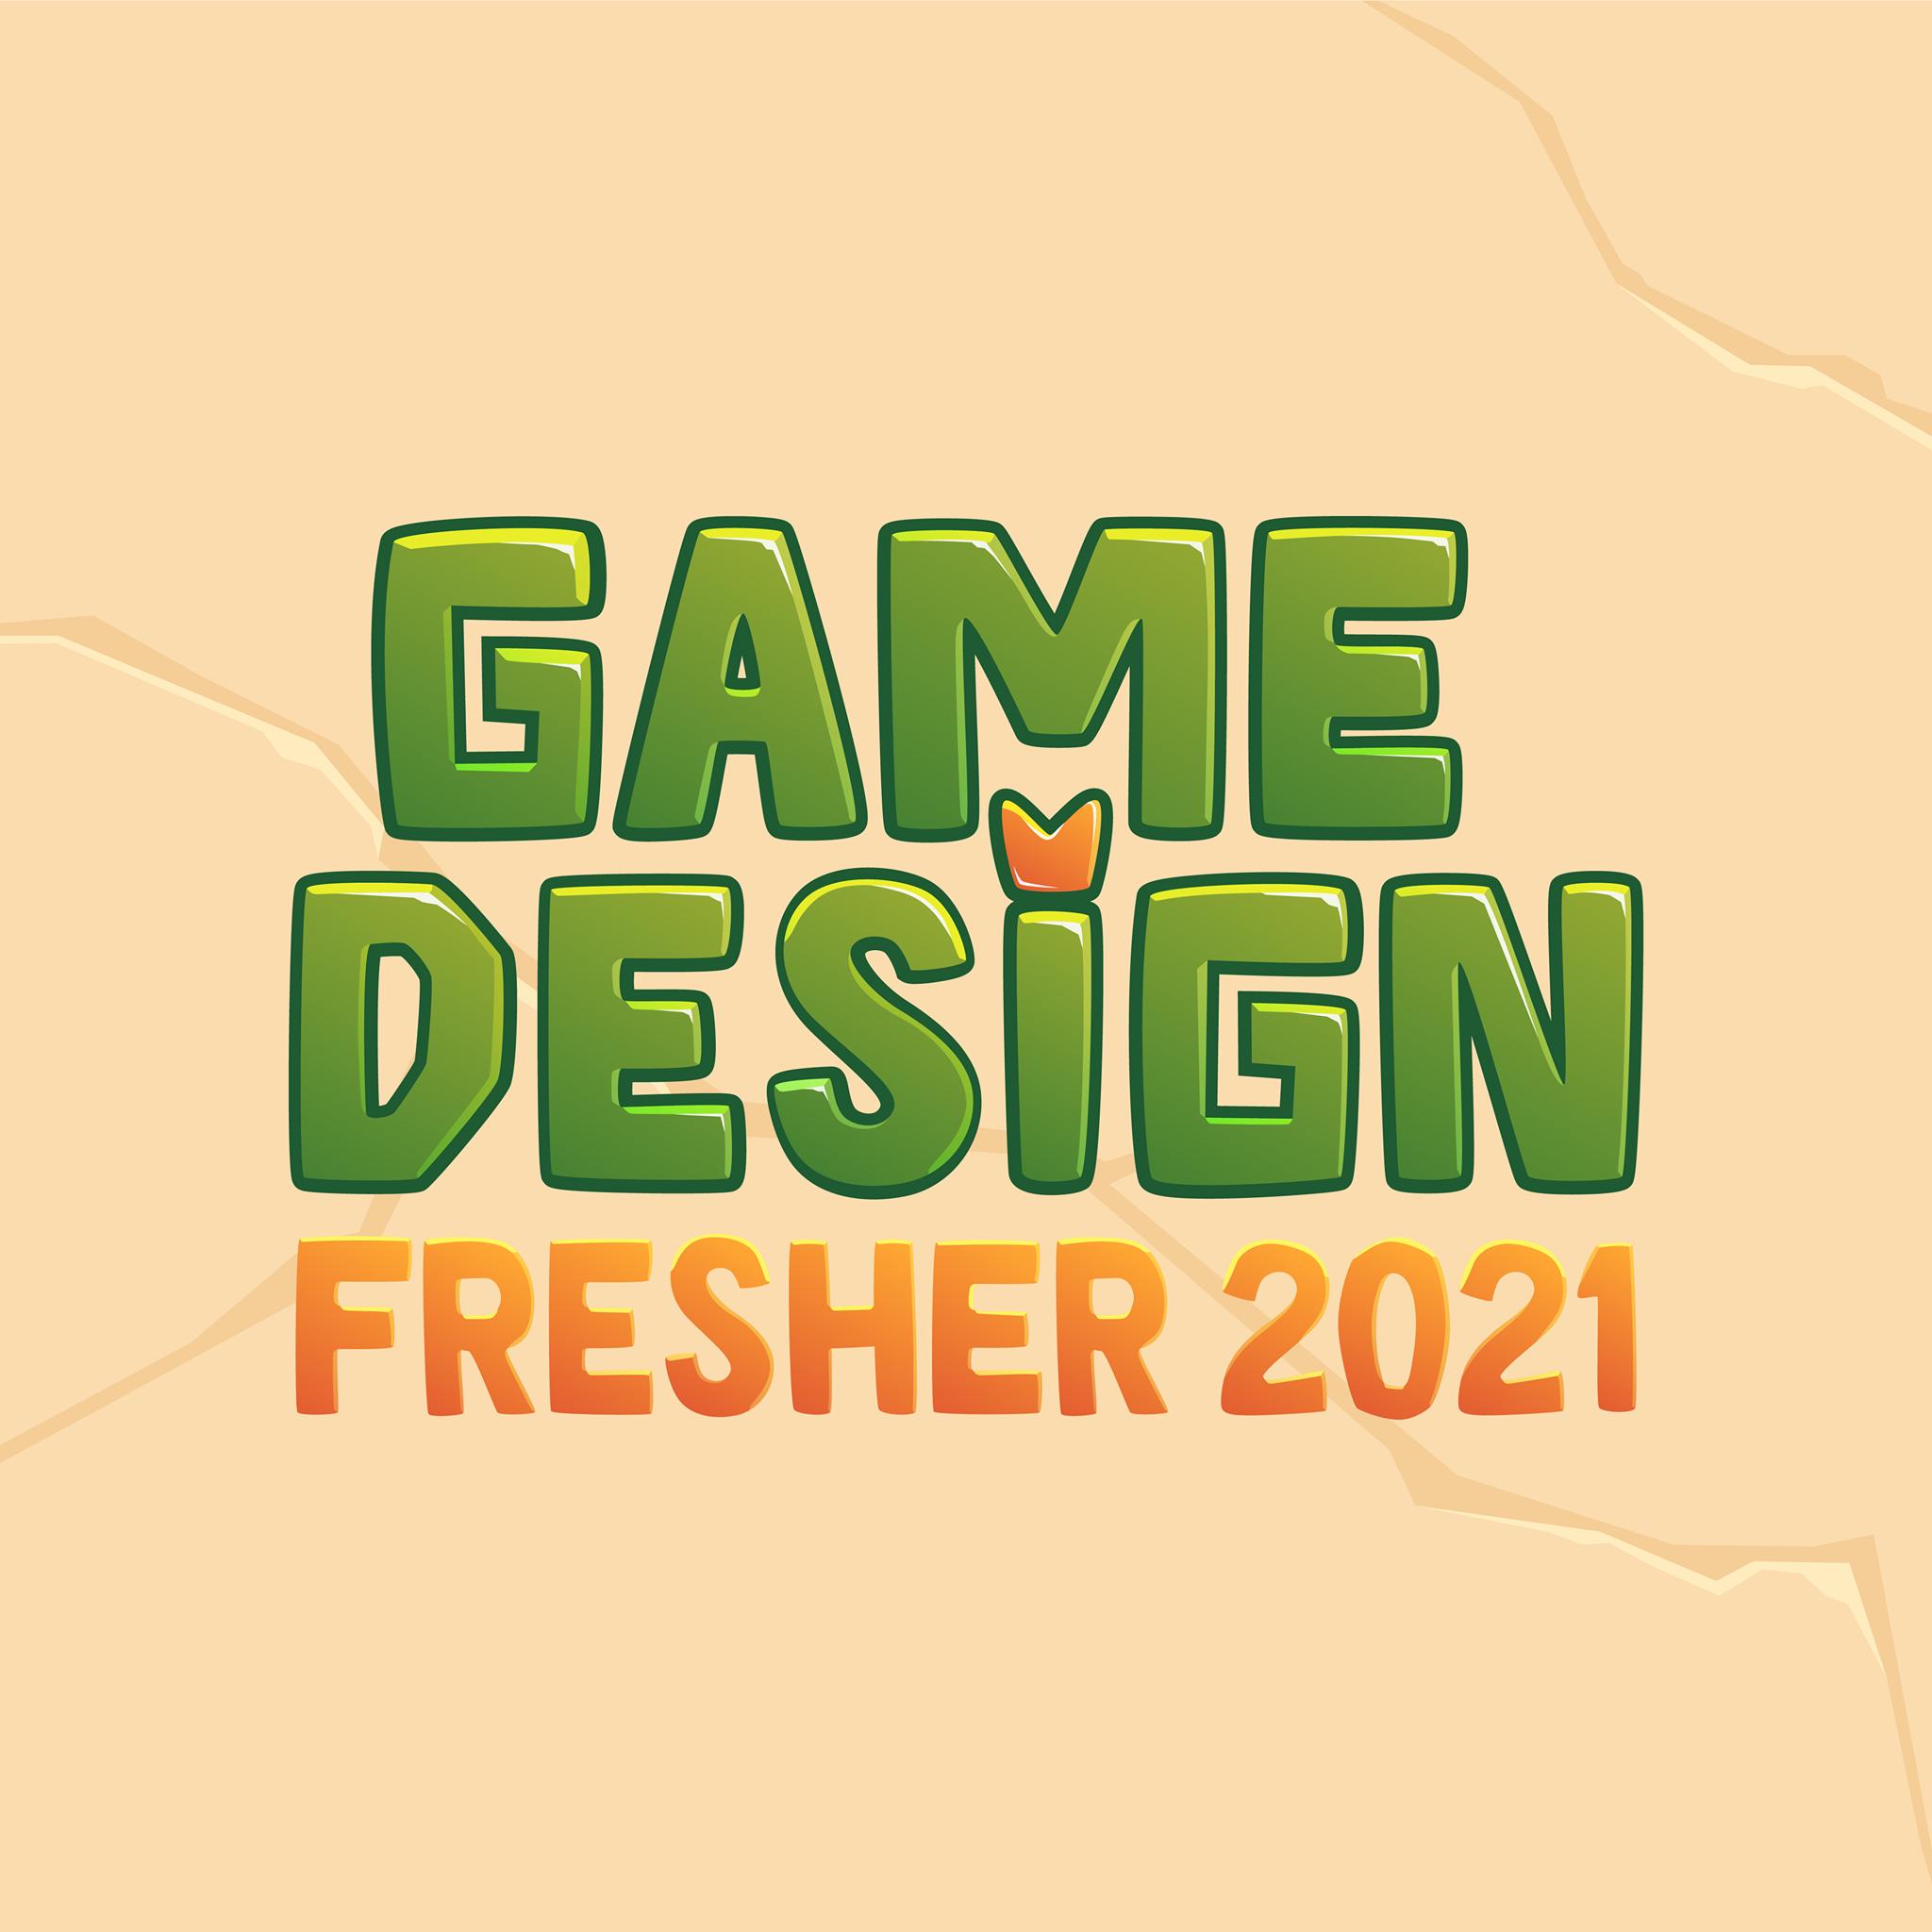 GAME DESIGN FRESHER